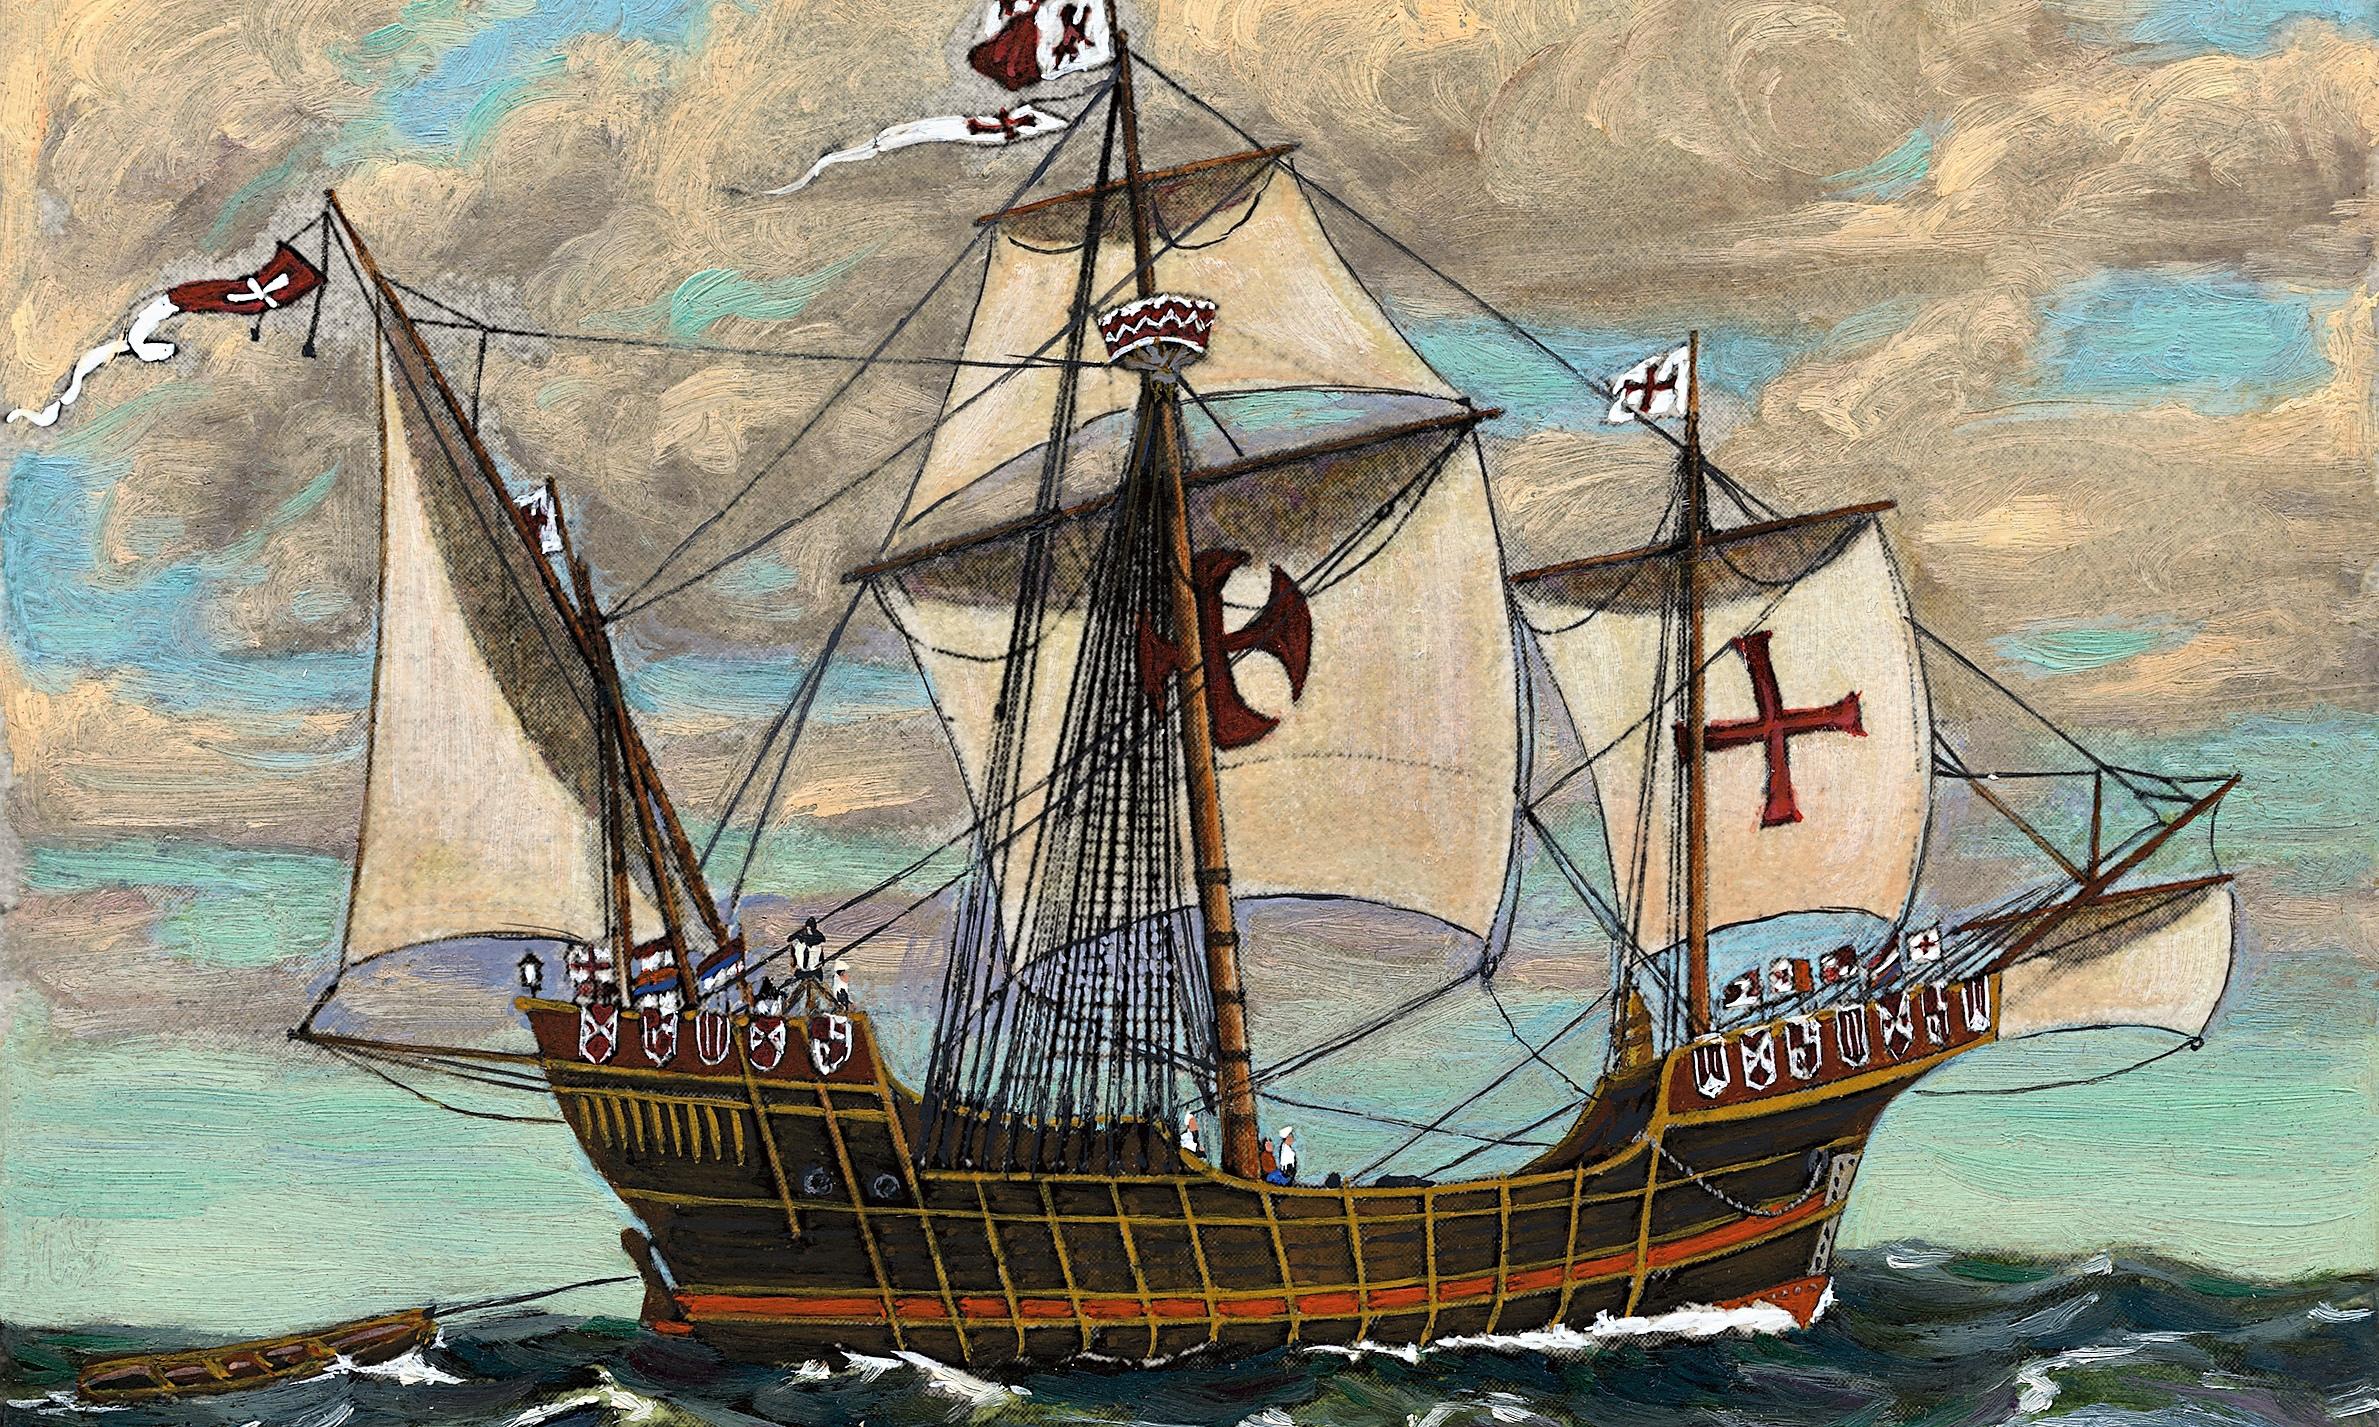 Haiti Shipwreck Is Not Columbus U2019s Santa Maria  Says Unesco